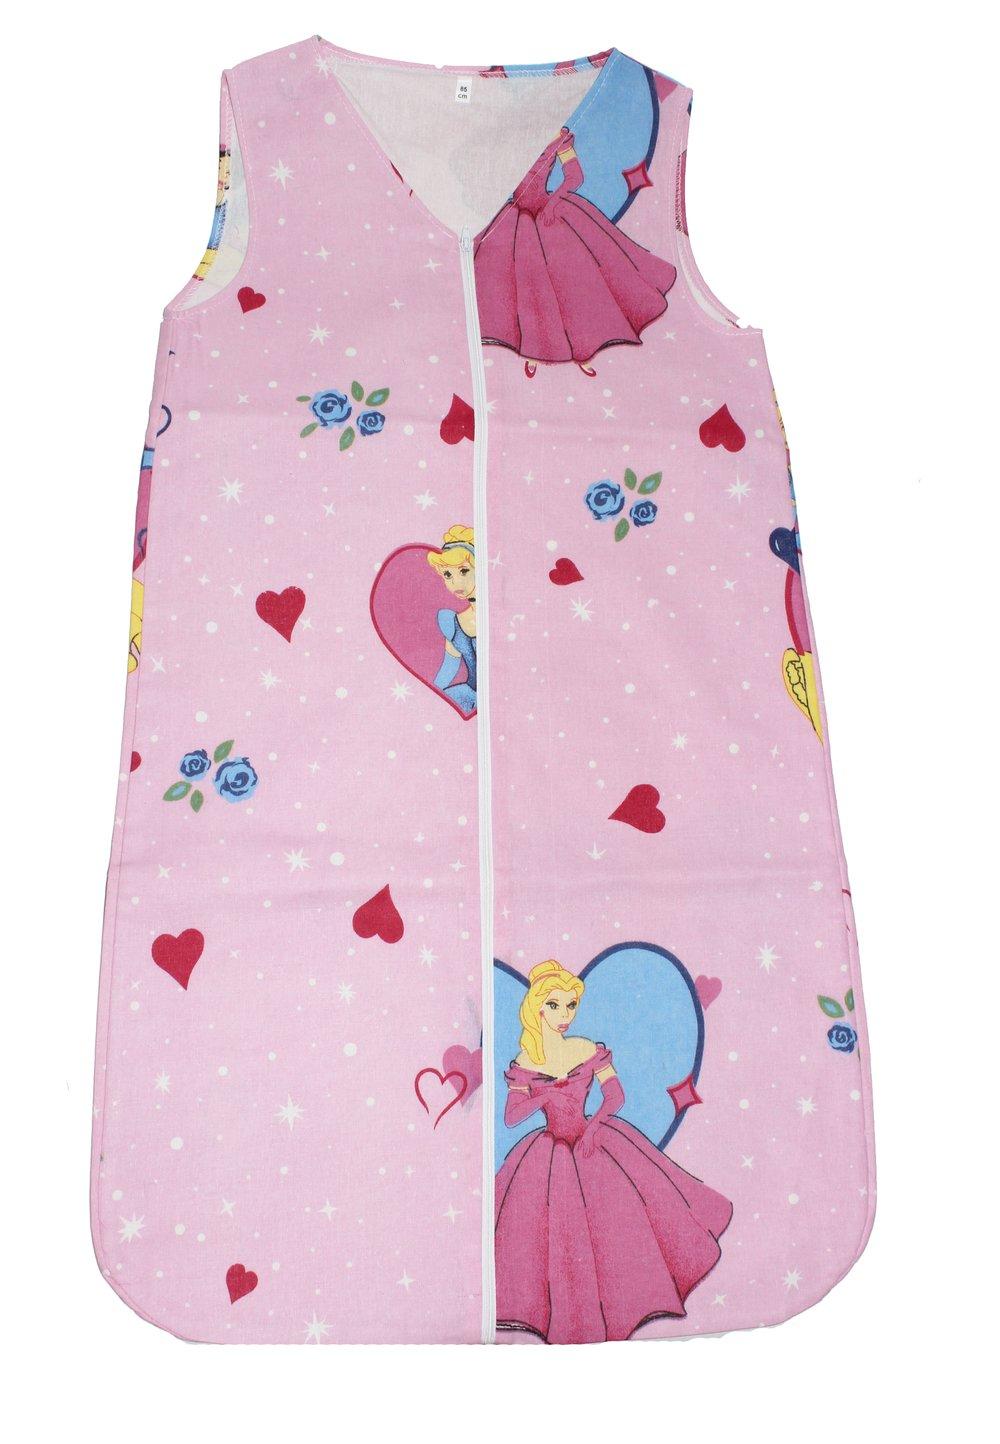 Sac de dormit vara Princess roz imagine